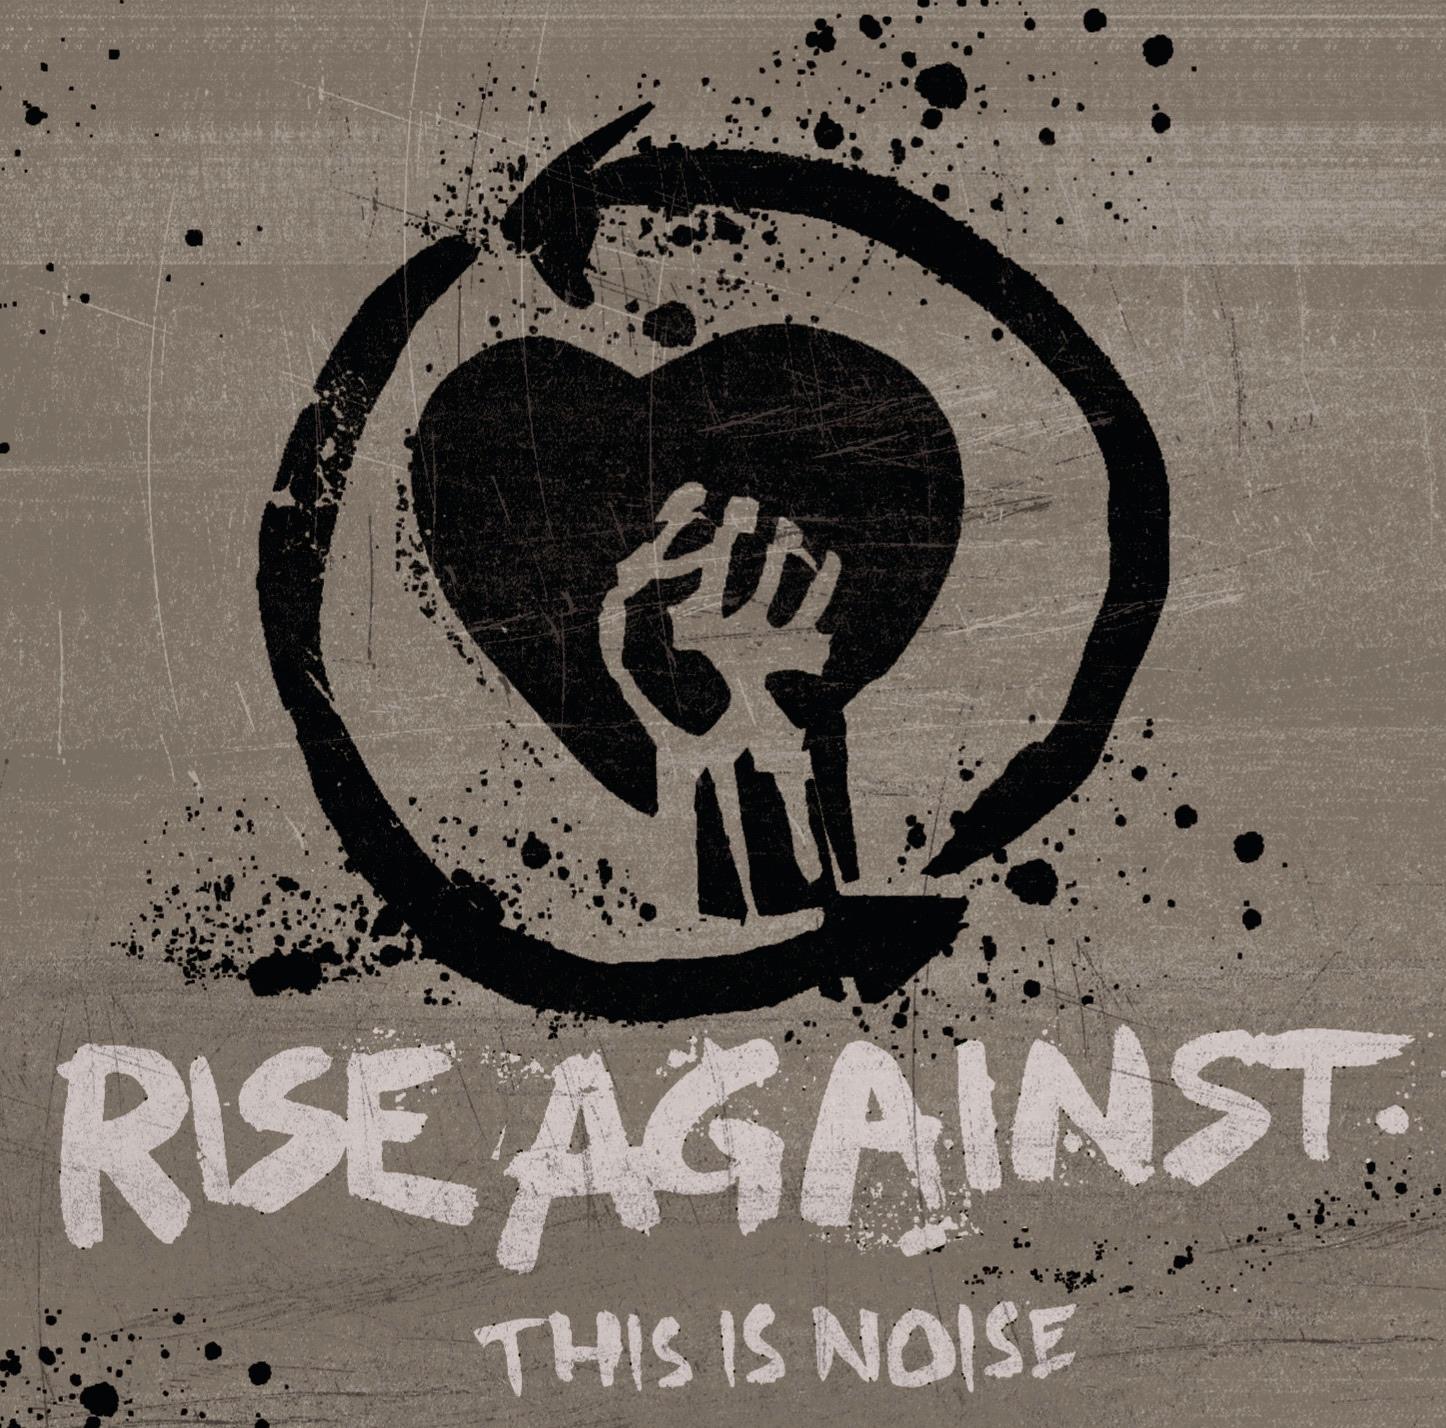 Rise Against album This Is Noise